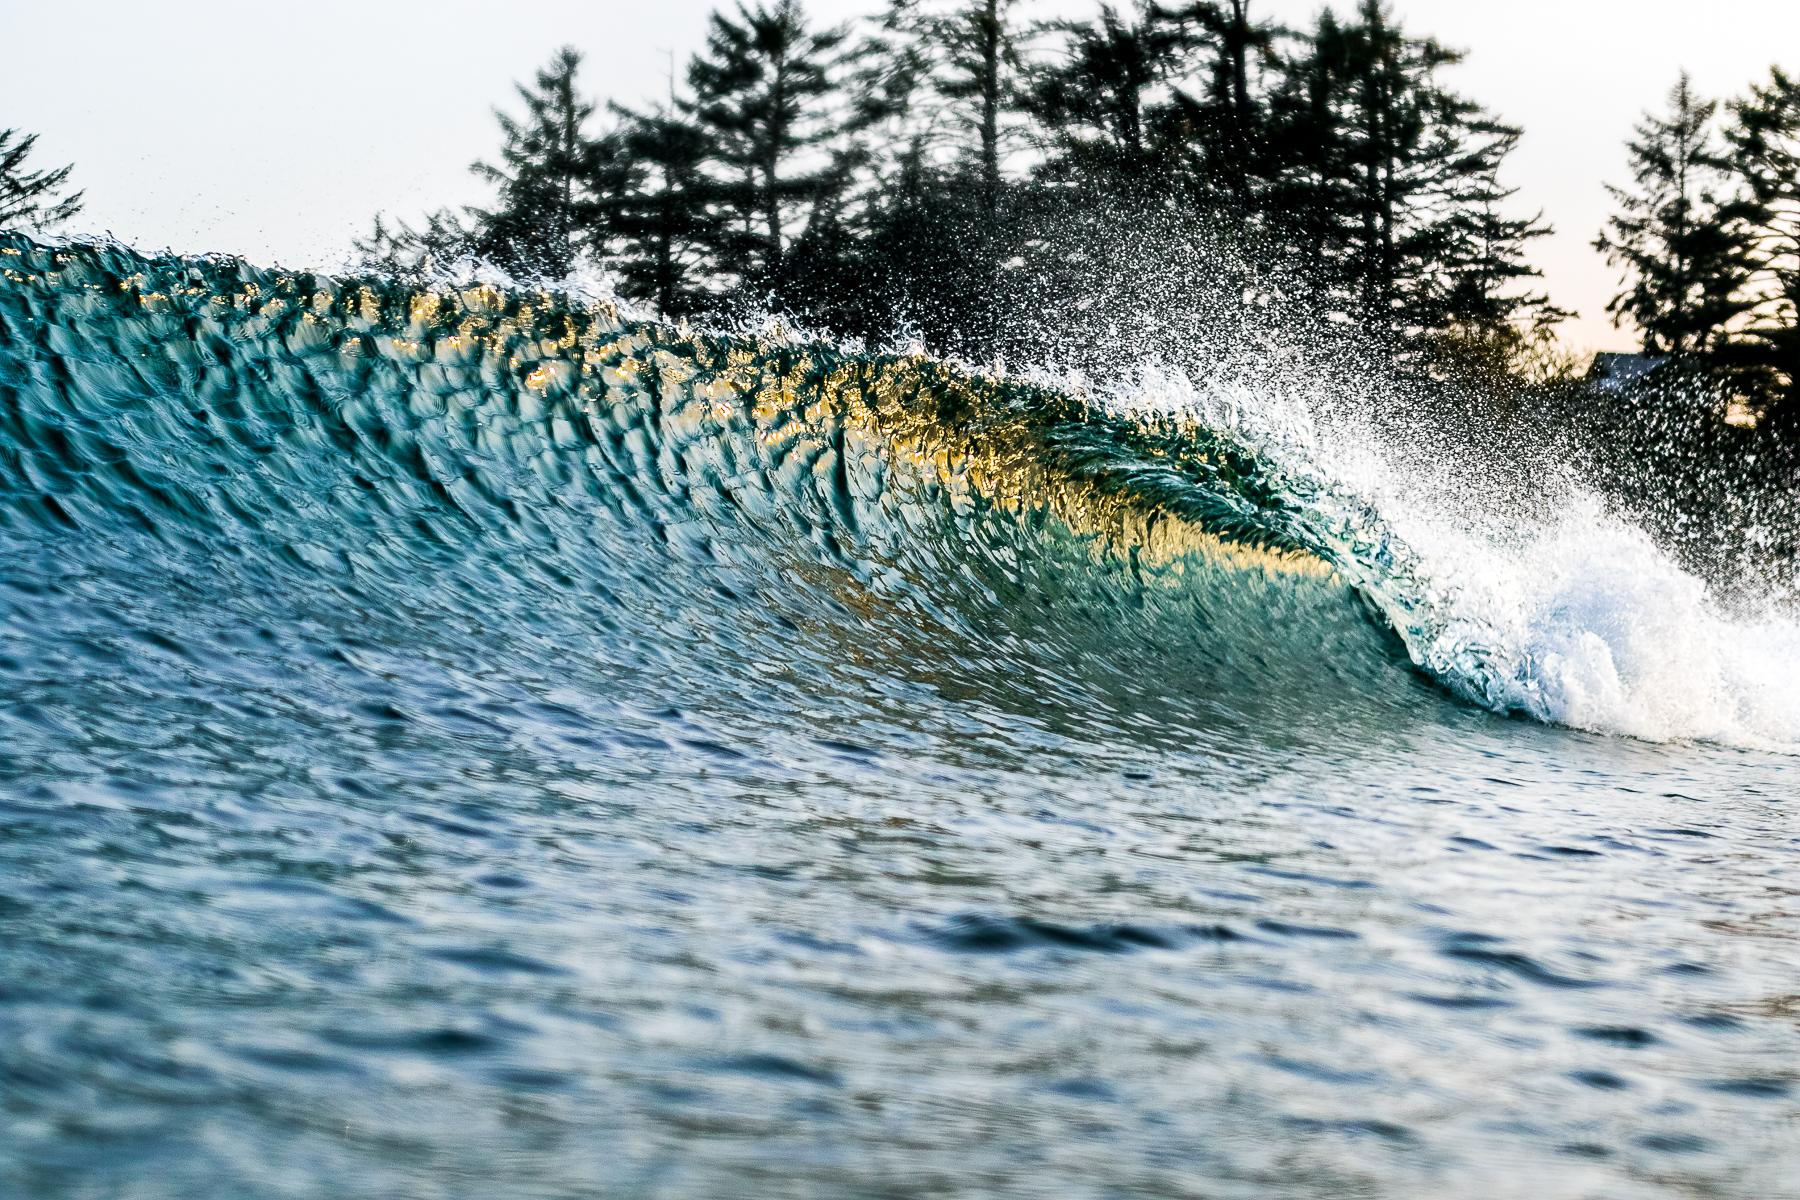 tofino_surf_photography-evening_gold_2.jpg